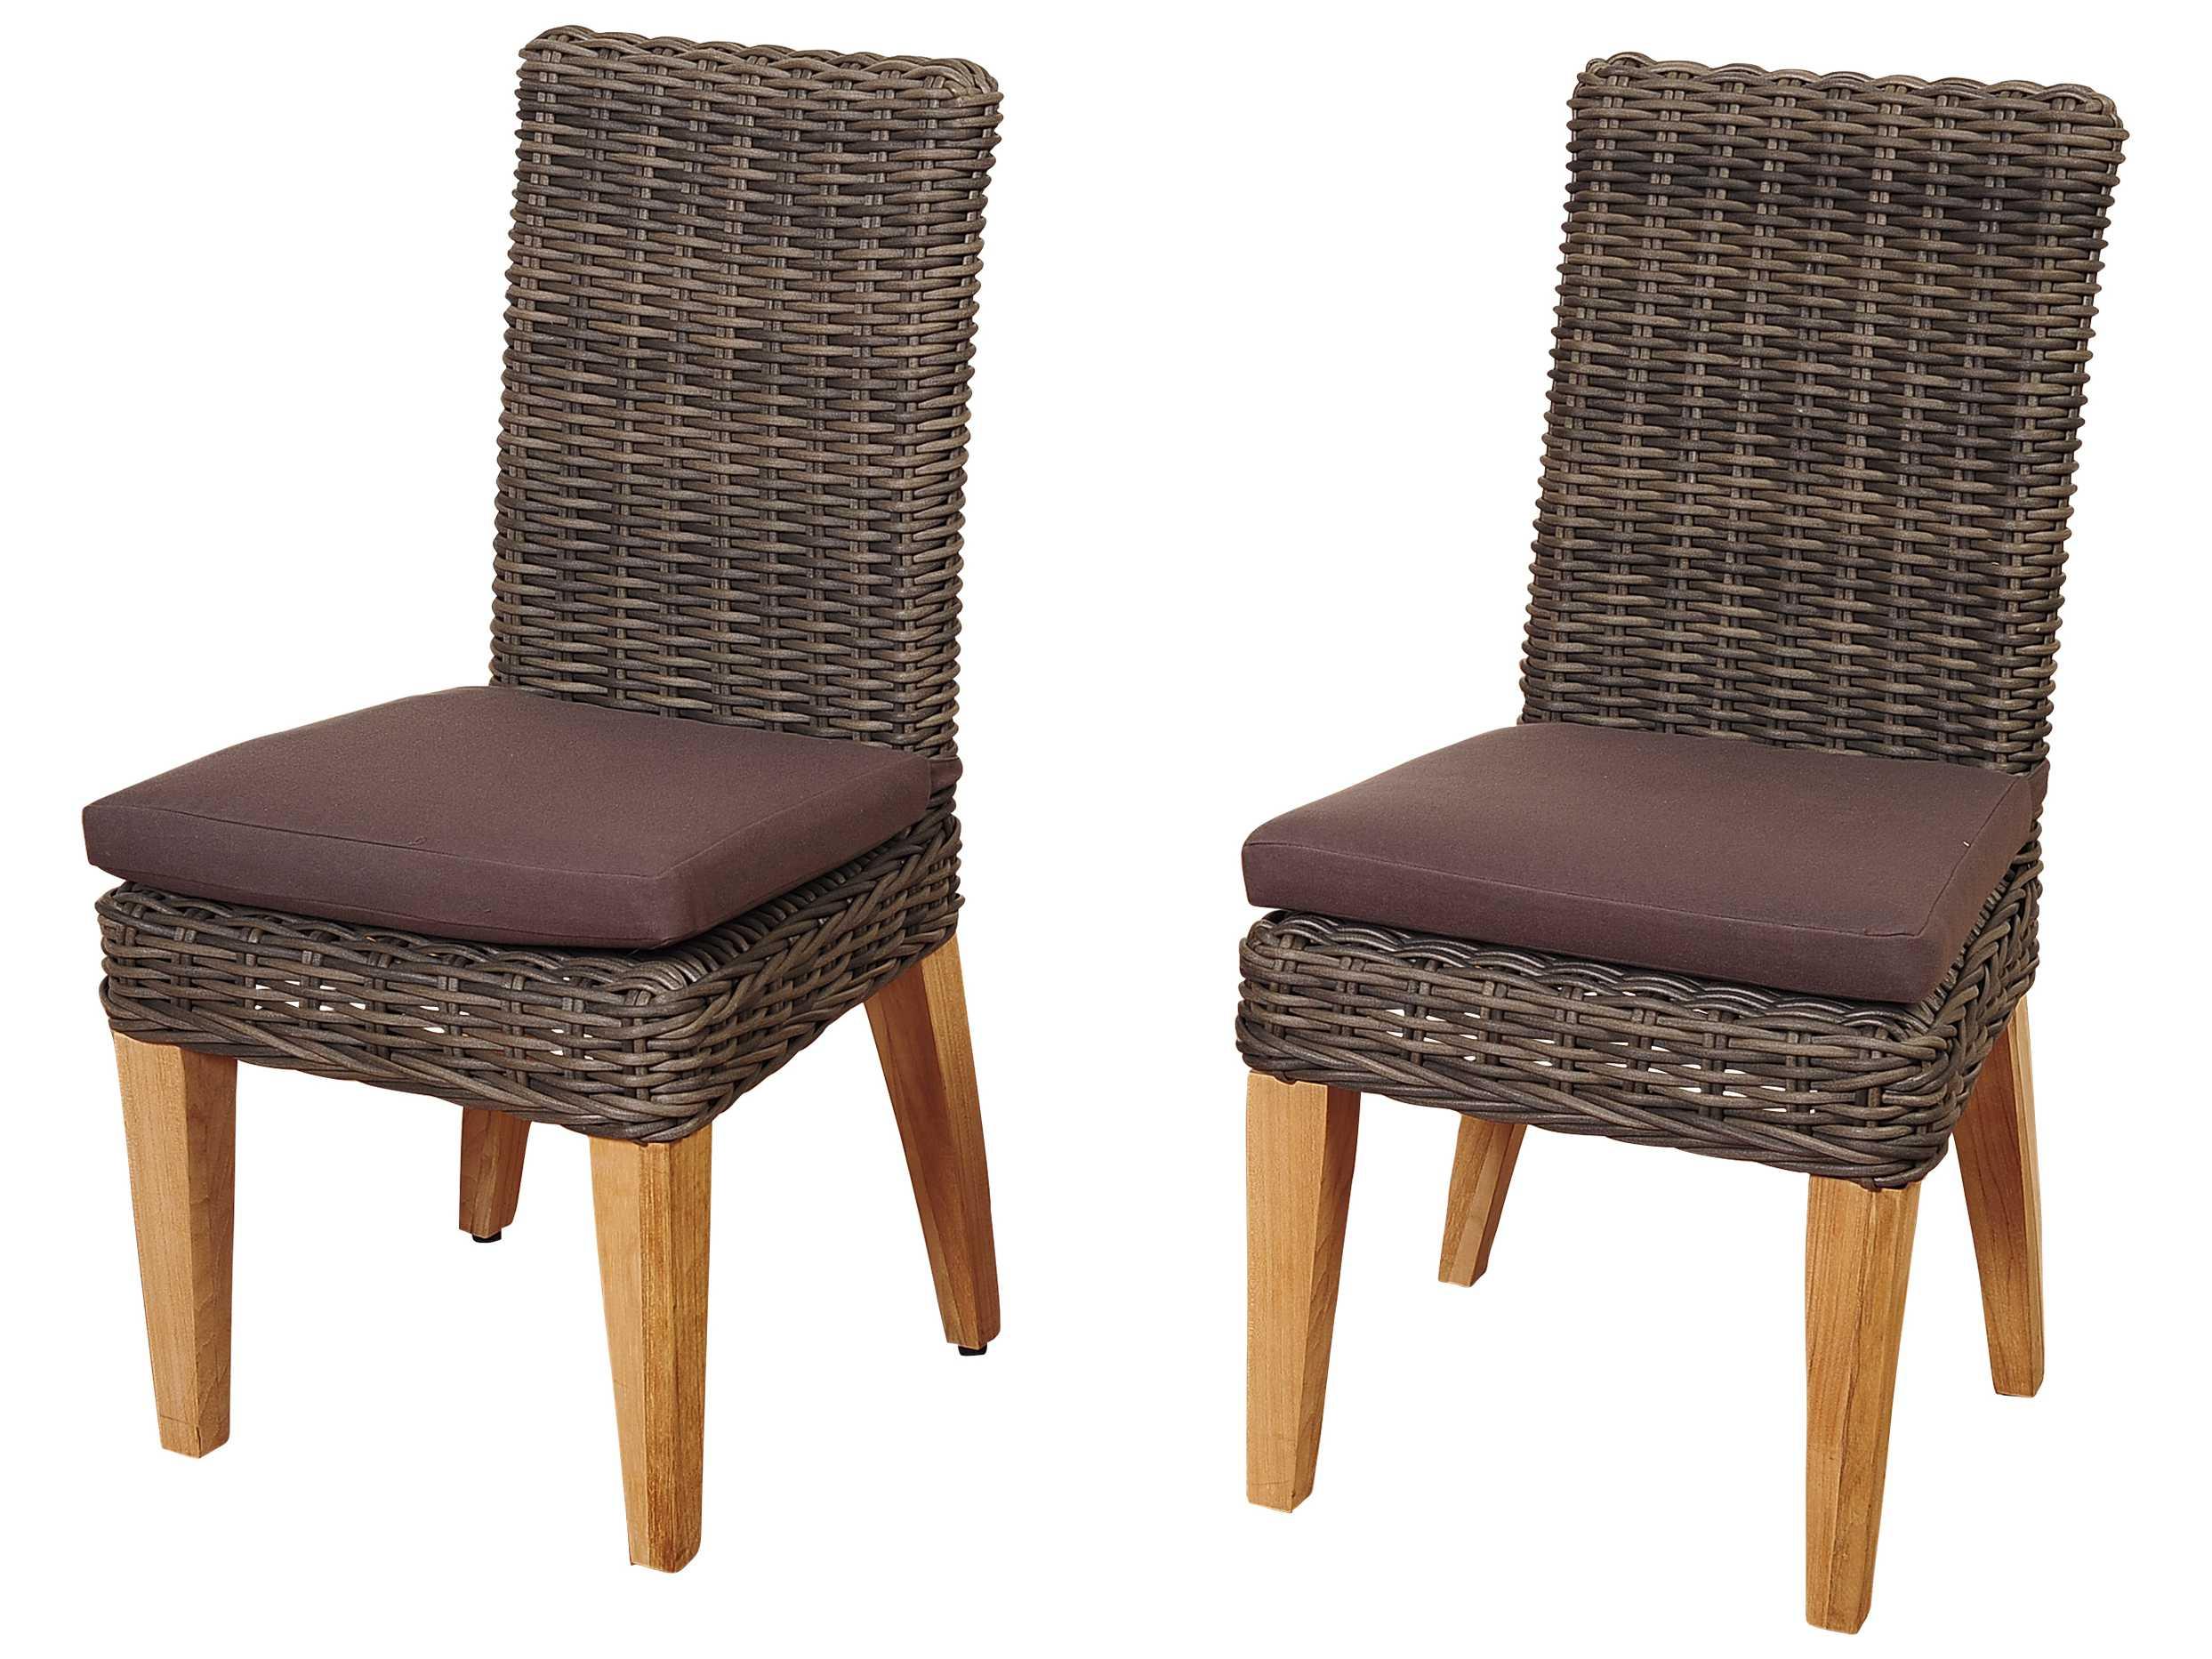 International Home Miami Amazonia Teak Wicker Singapore 2 Piece Arm Chair Set With Brown Cushions